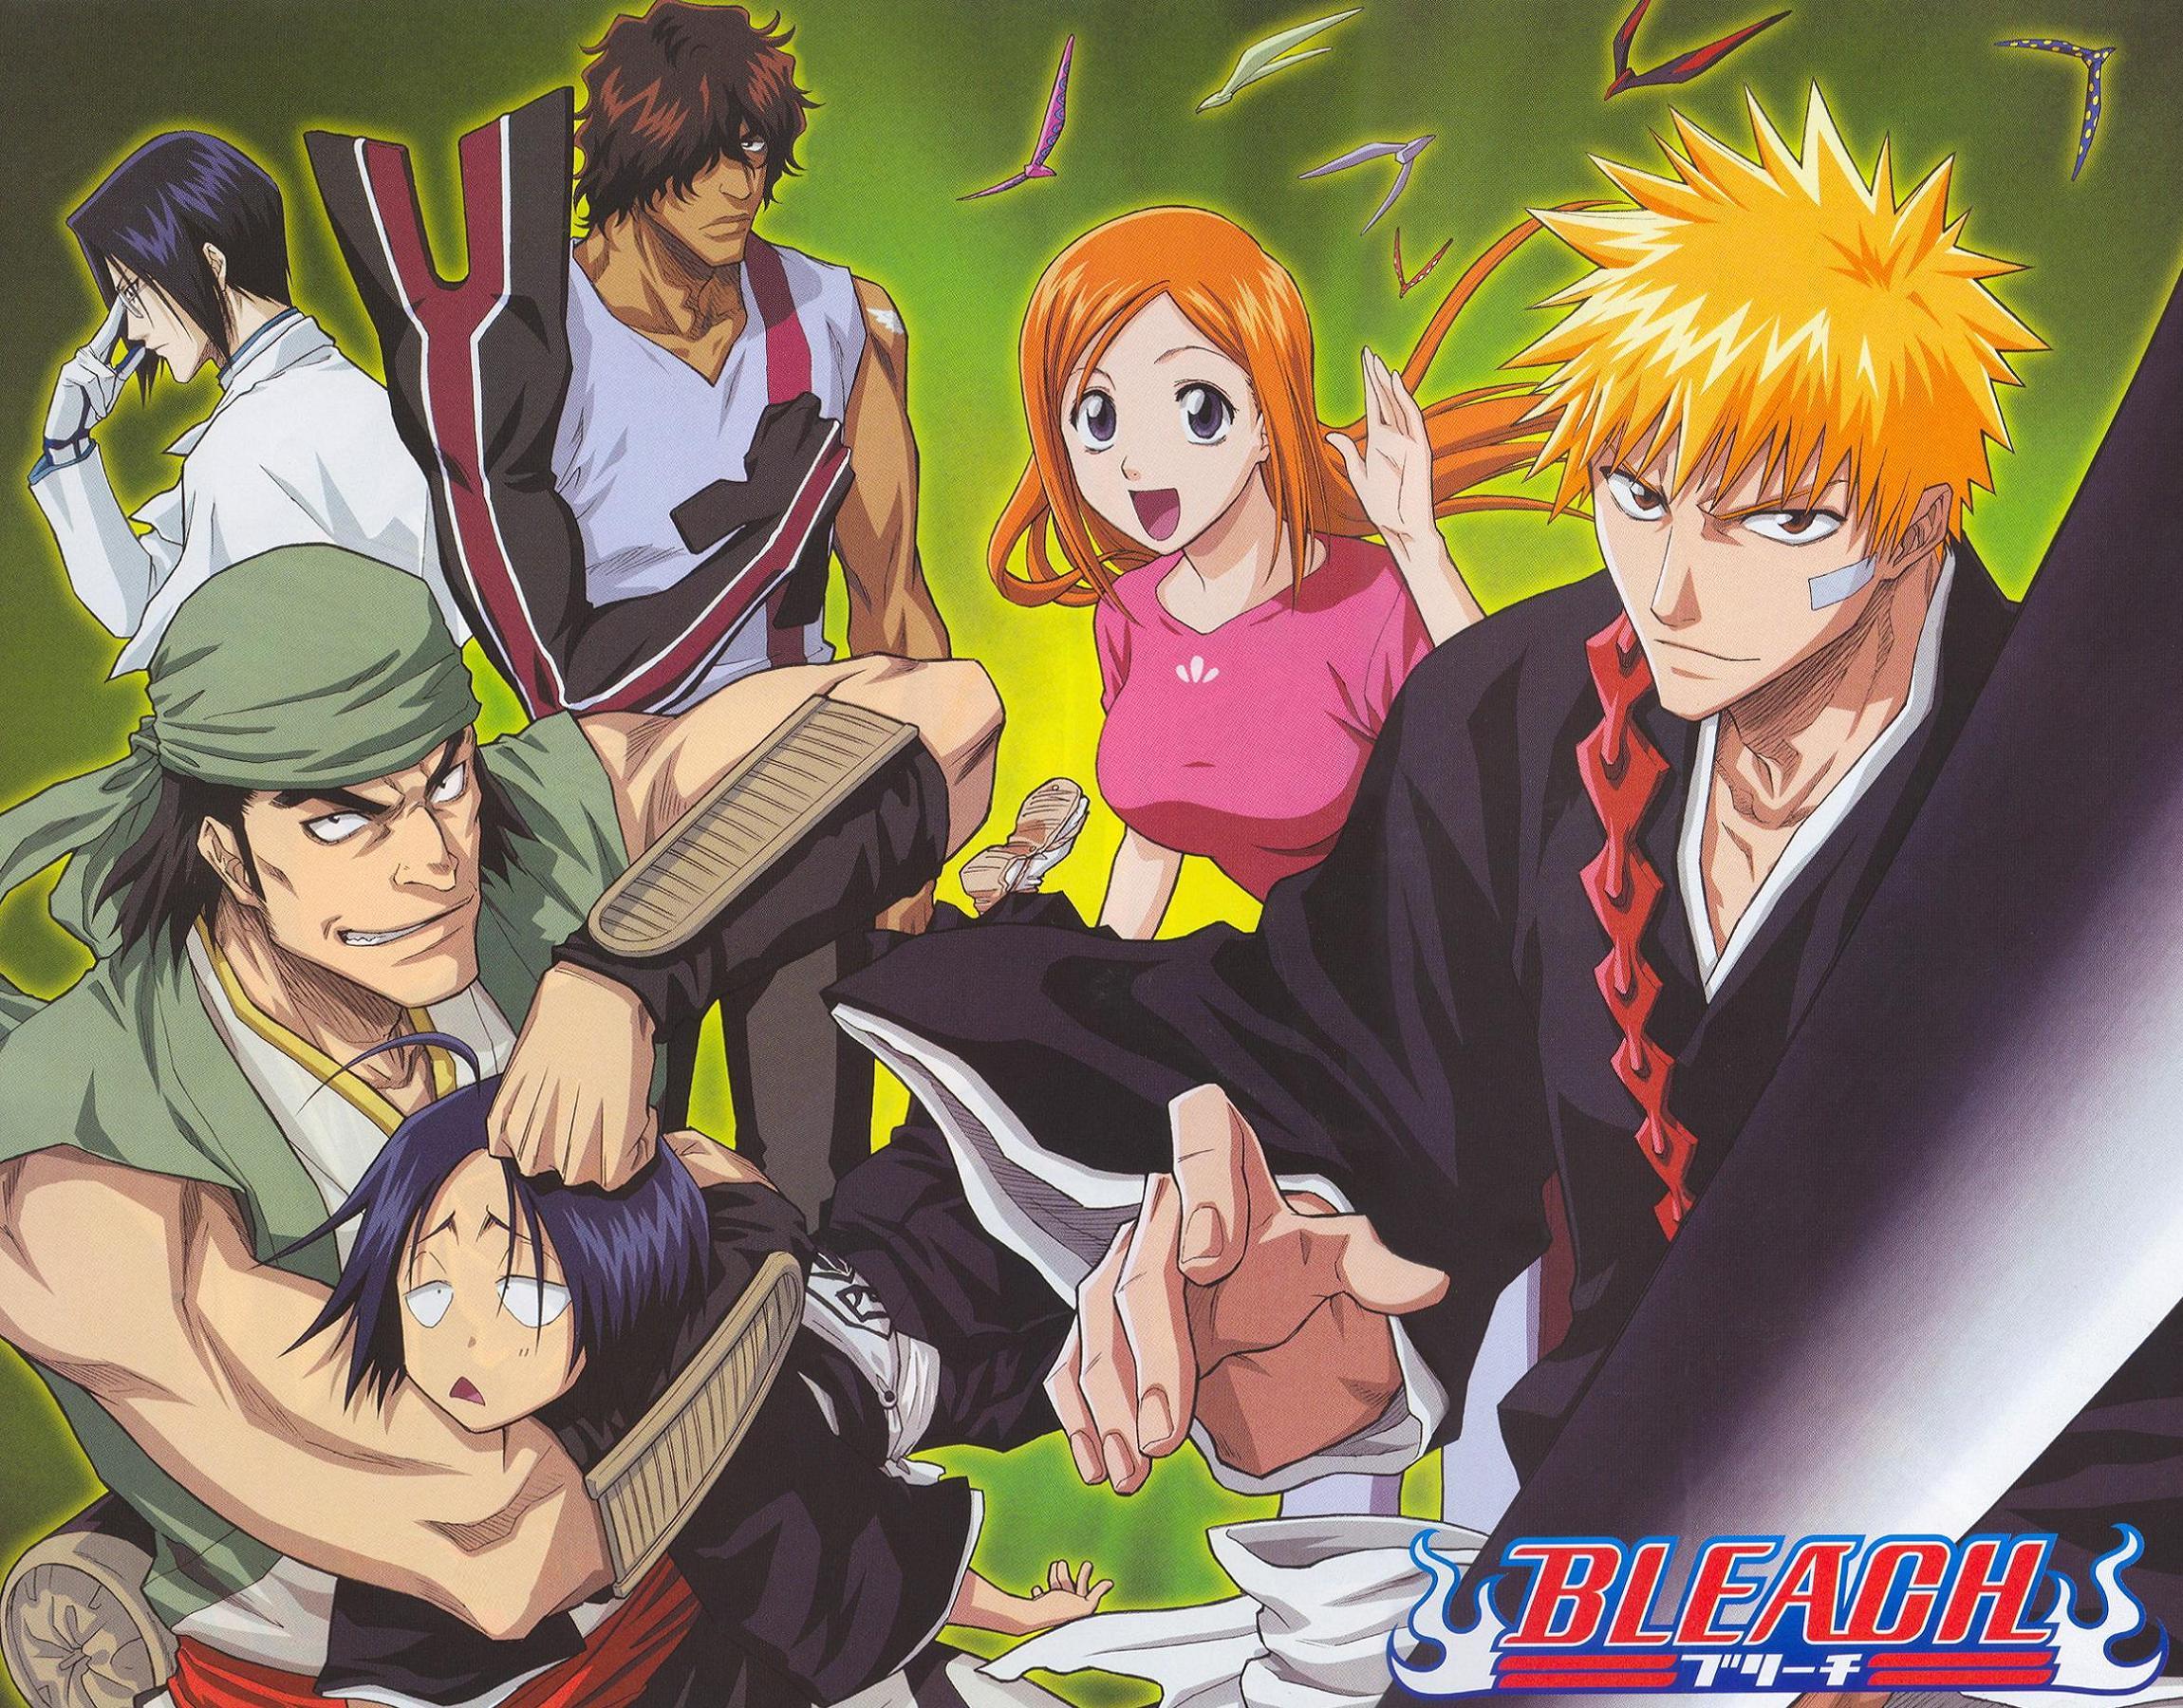 80514 - Un género, un anime - Hablemos de Anime y Manga